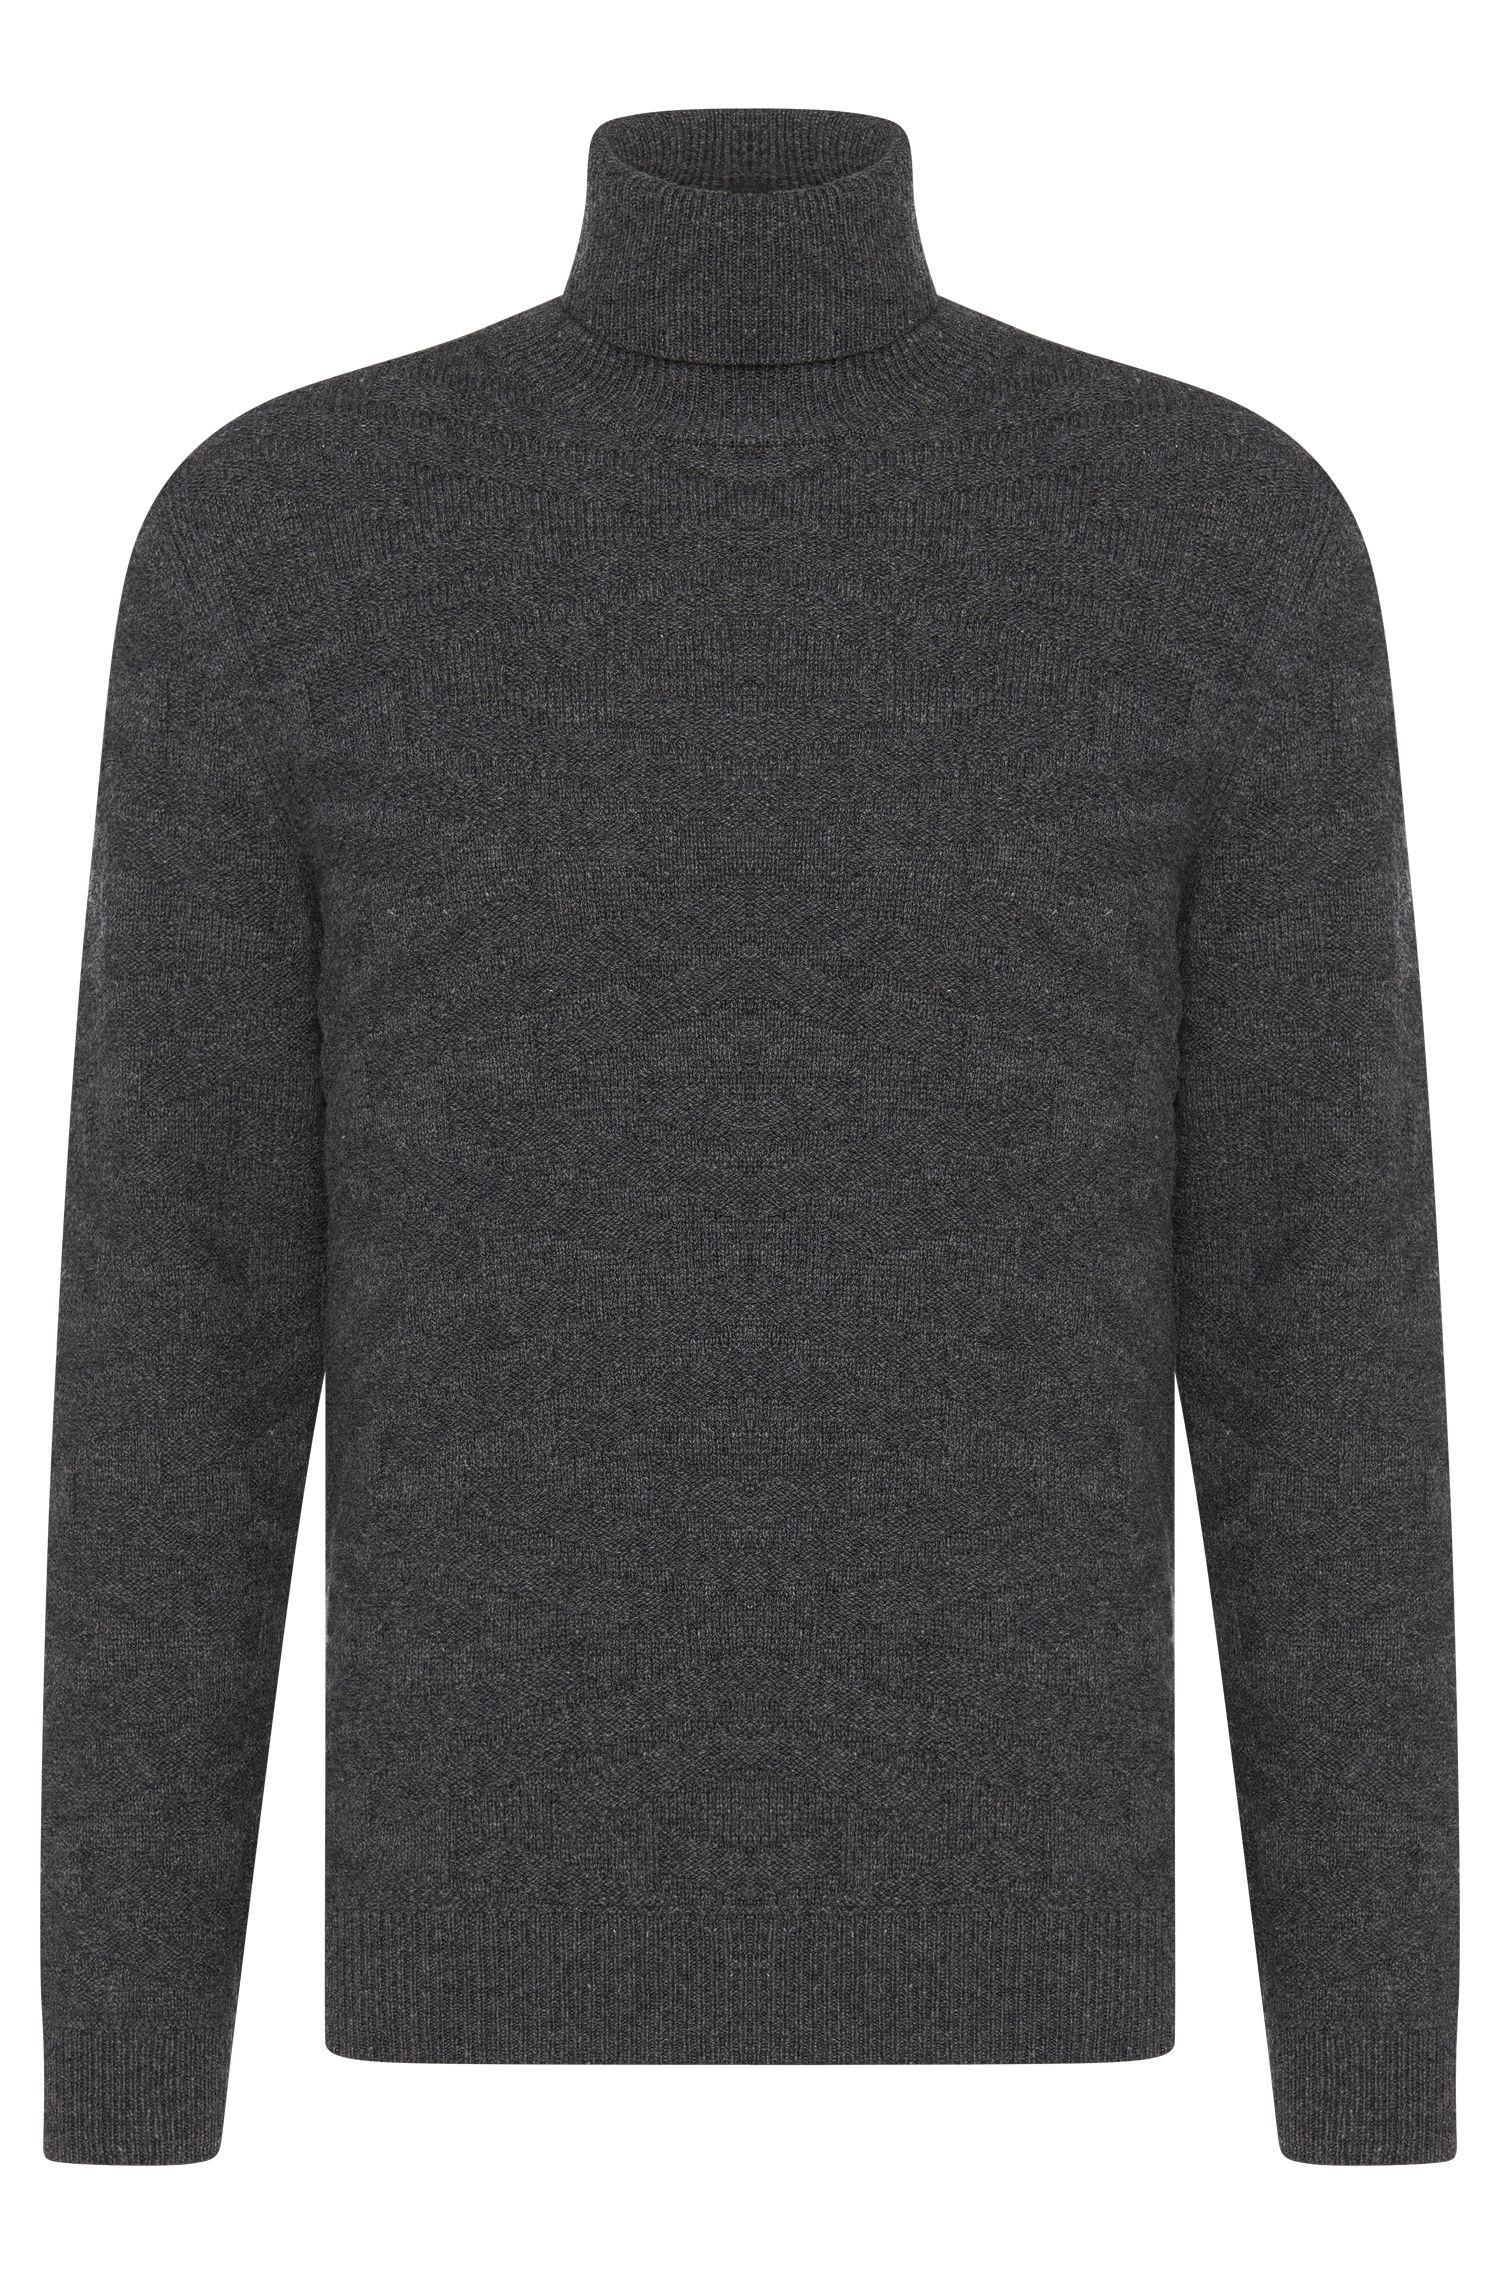 'Bertuzzi' | Virgin Wool Cashmere Jacquard Pattern Turtleneck